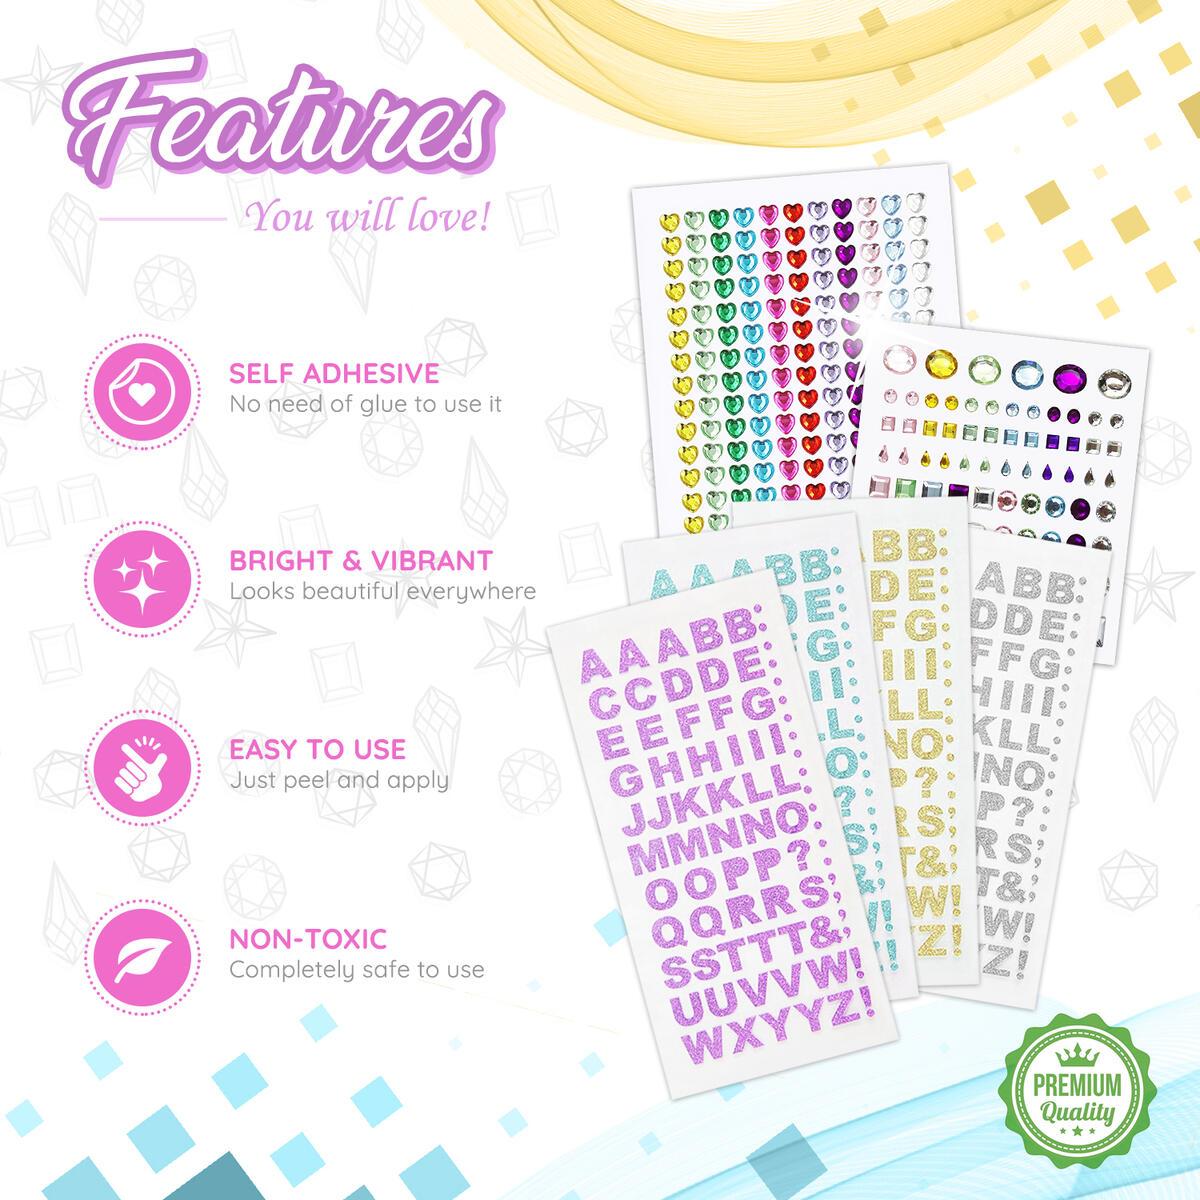 1065 Pcs Bulk Kit Set I Rhinestones Sticker Flatback Adhesive Gems Foam Glitter Letter Stickers I Assorted Sheets Size I Art Crafts, Body Decorations, Self Craft Rhinestone Jewelry